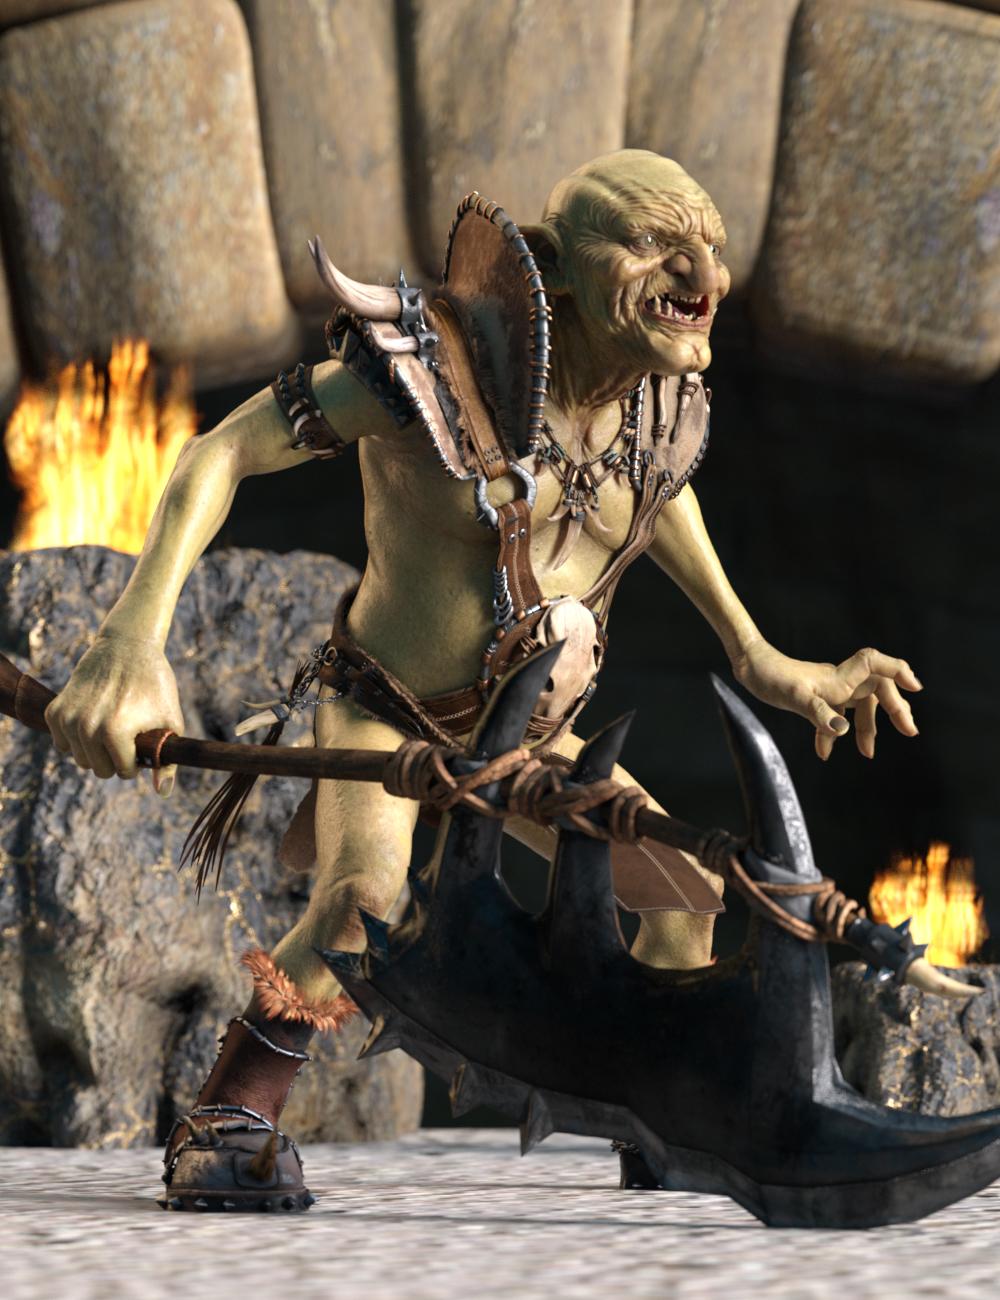 Warrior Goblin Poses for War Goblin HD by: Ensary, 3D Models by Daz 3D